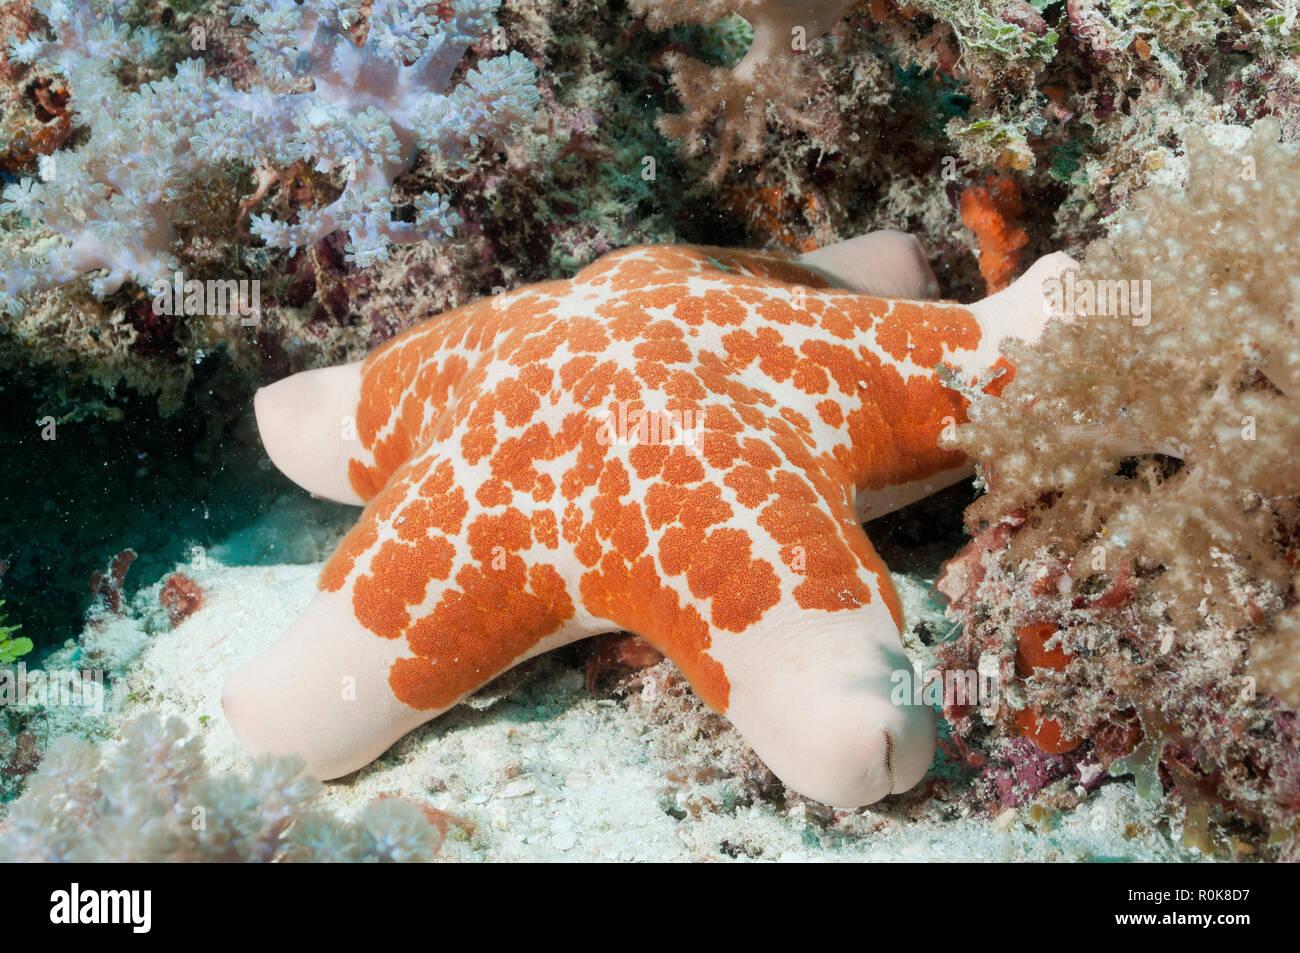 Starfish on top of healthy coral reef, Mnemba Atoll, Zanzibar, Tanzania. - Stock Image